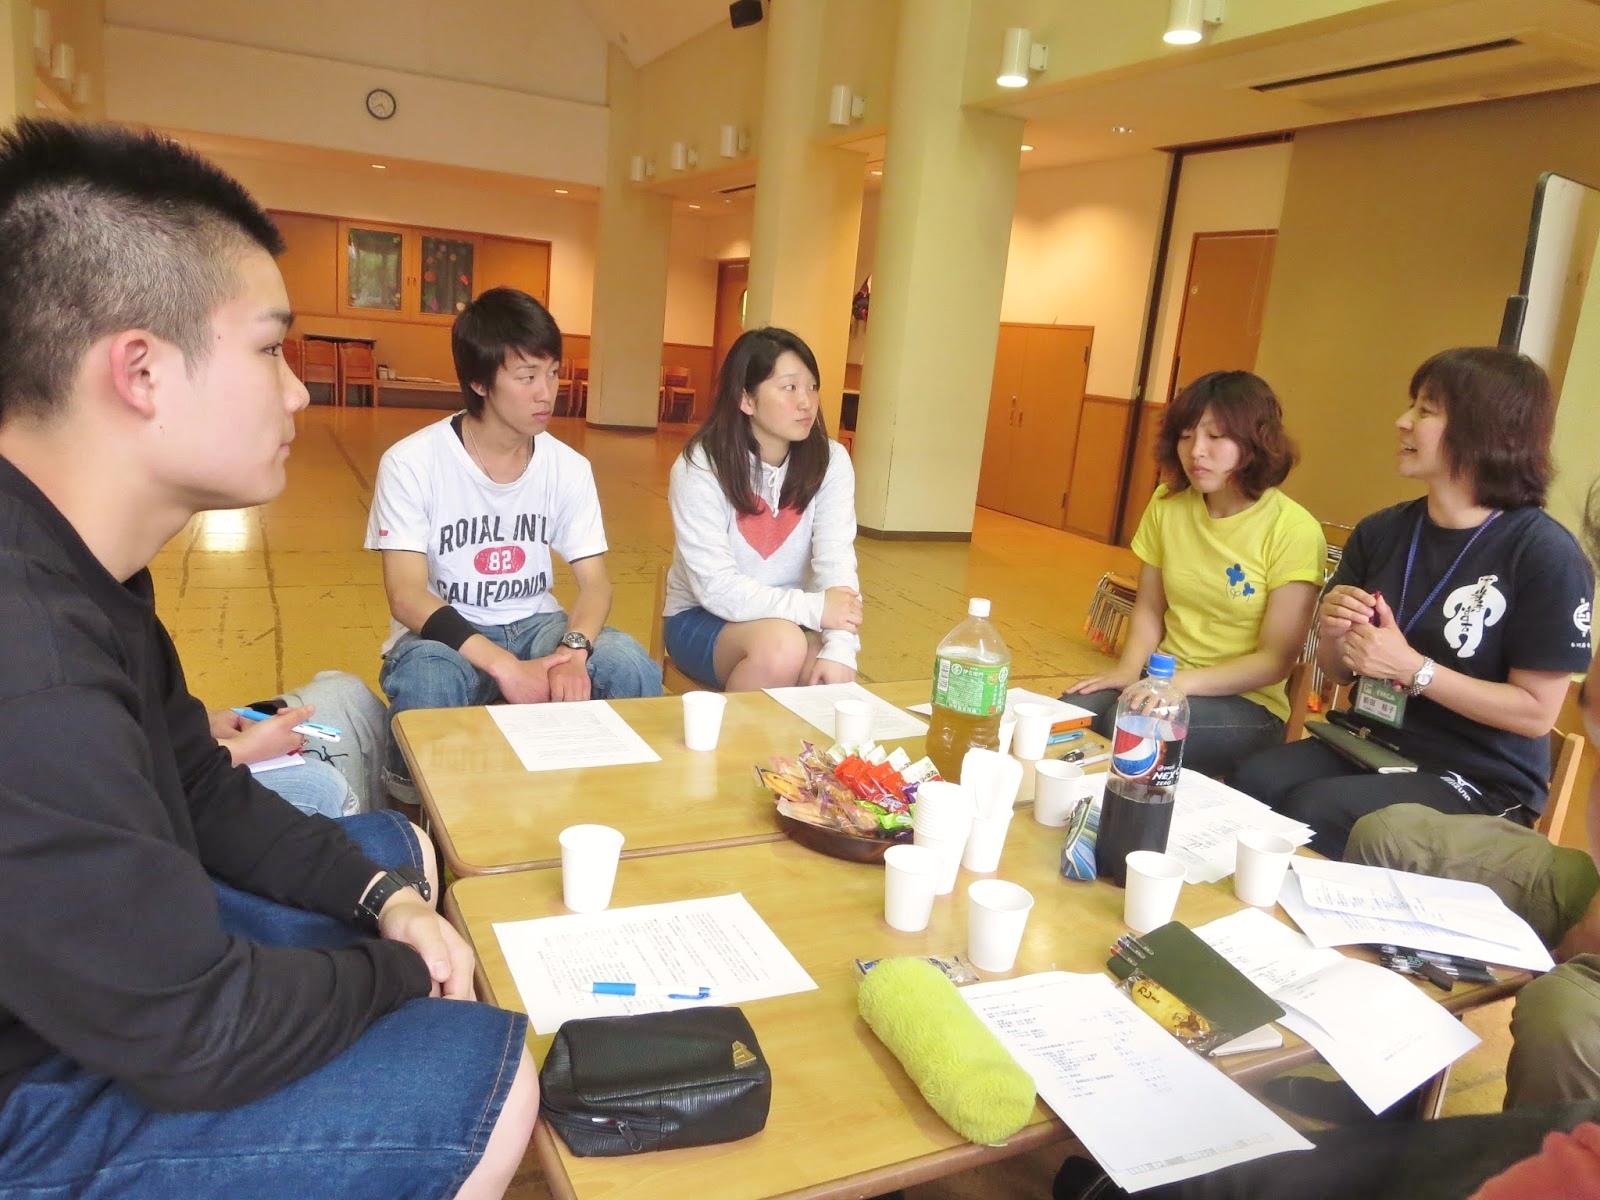 YMCAとつか保育園YMCAとつか乳児保育園 公式ブログ: 保育リーダーの活動が始まりました